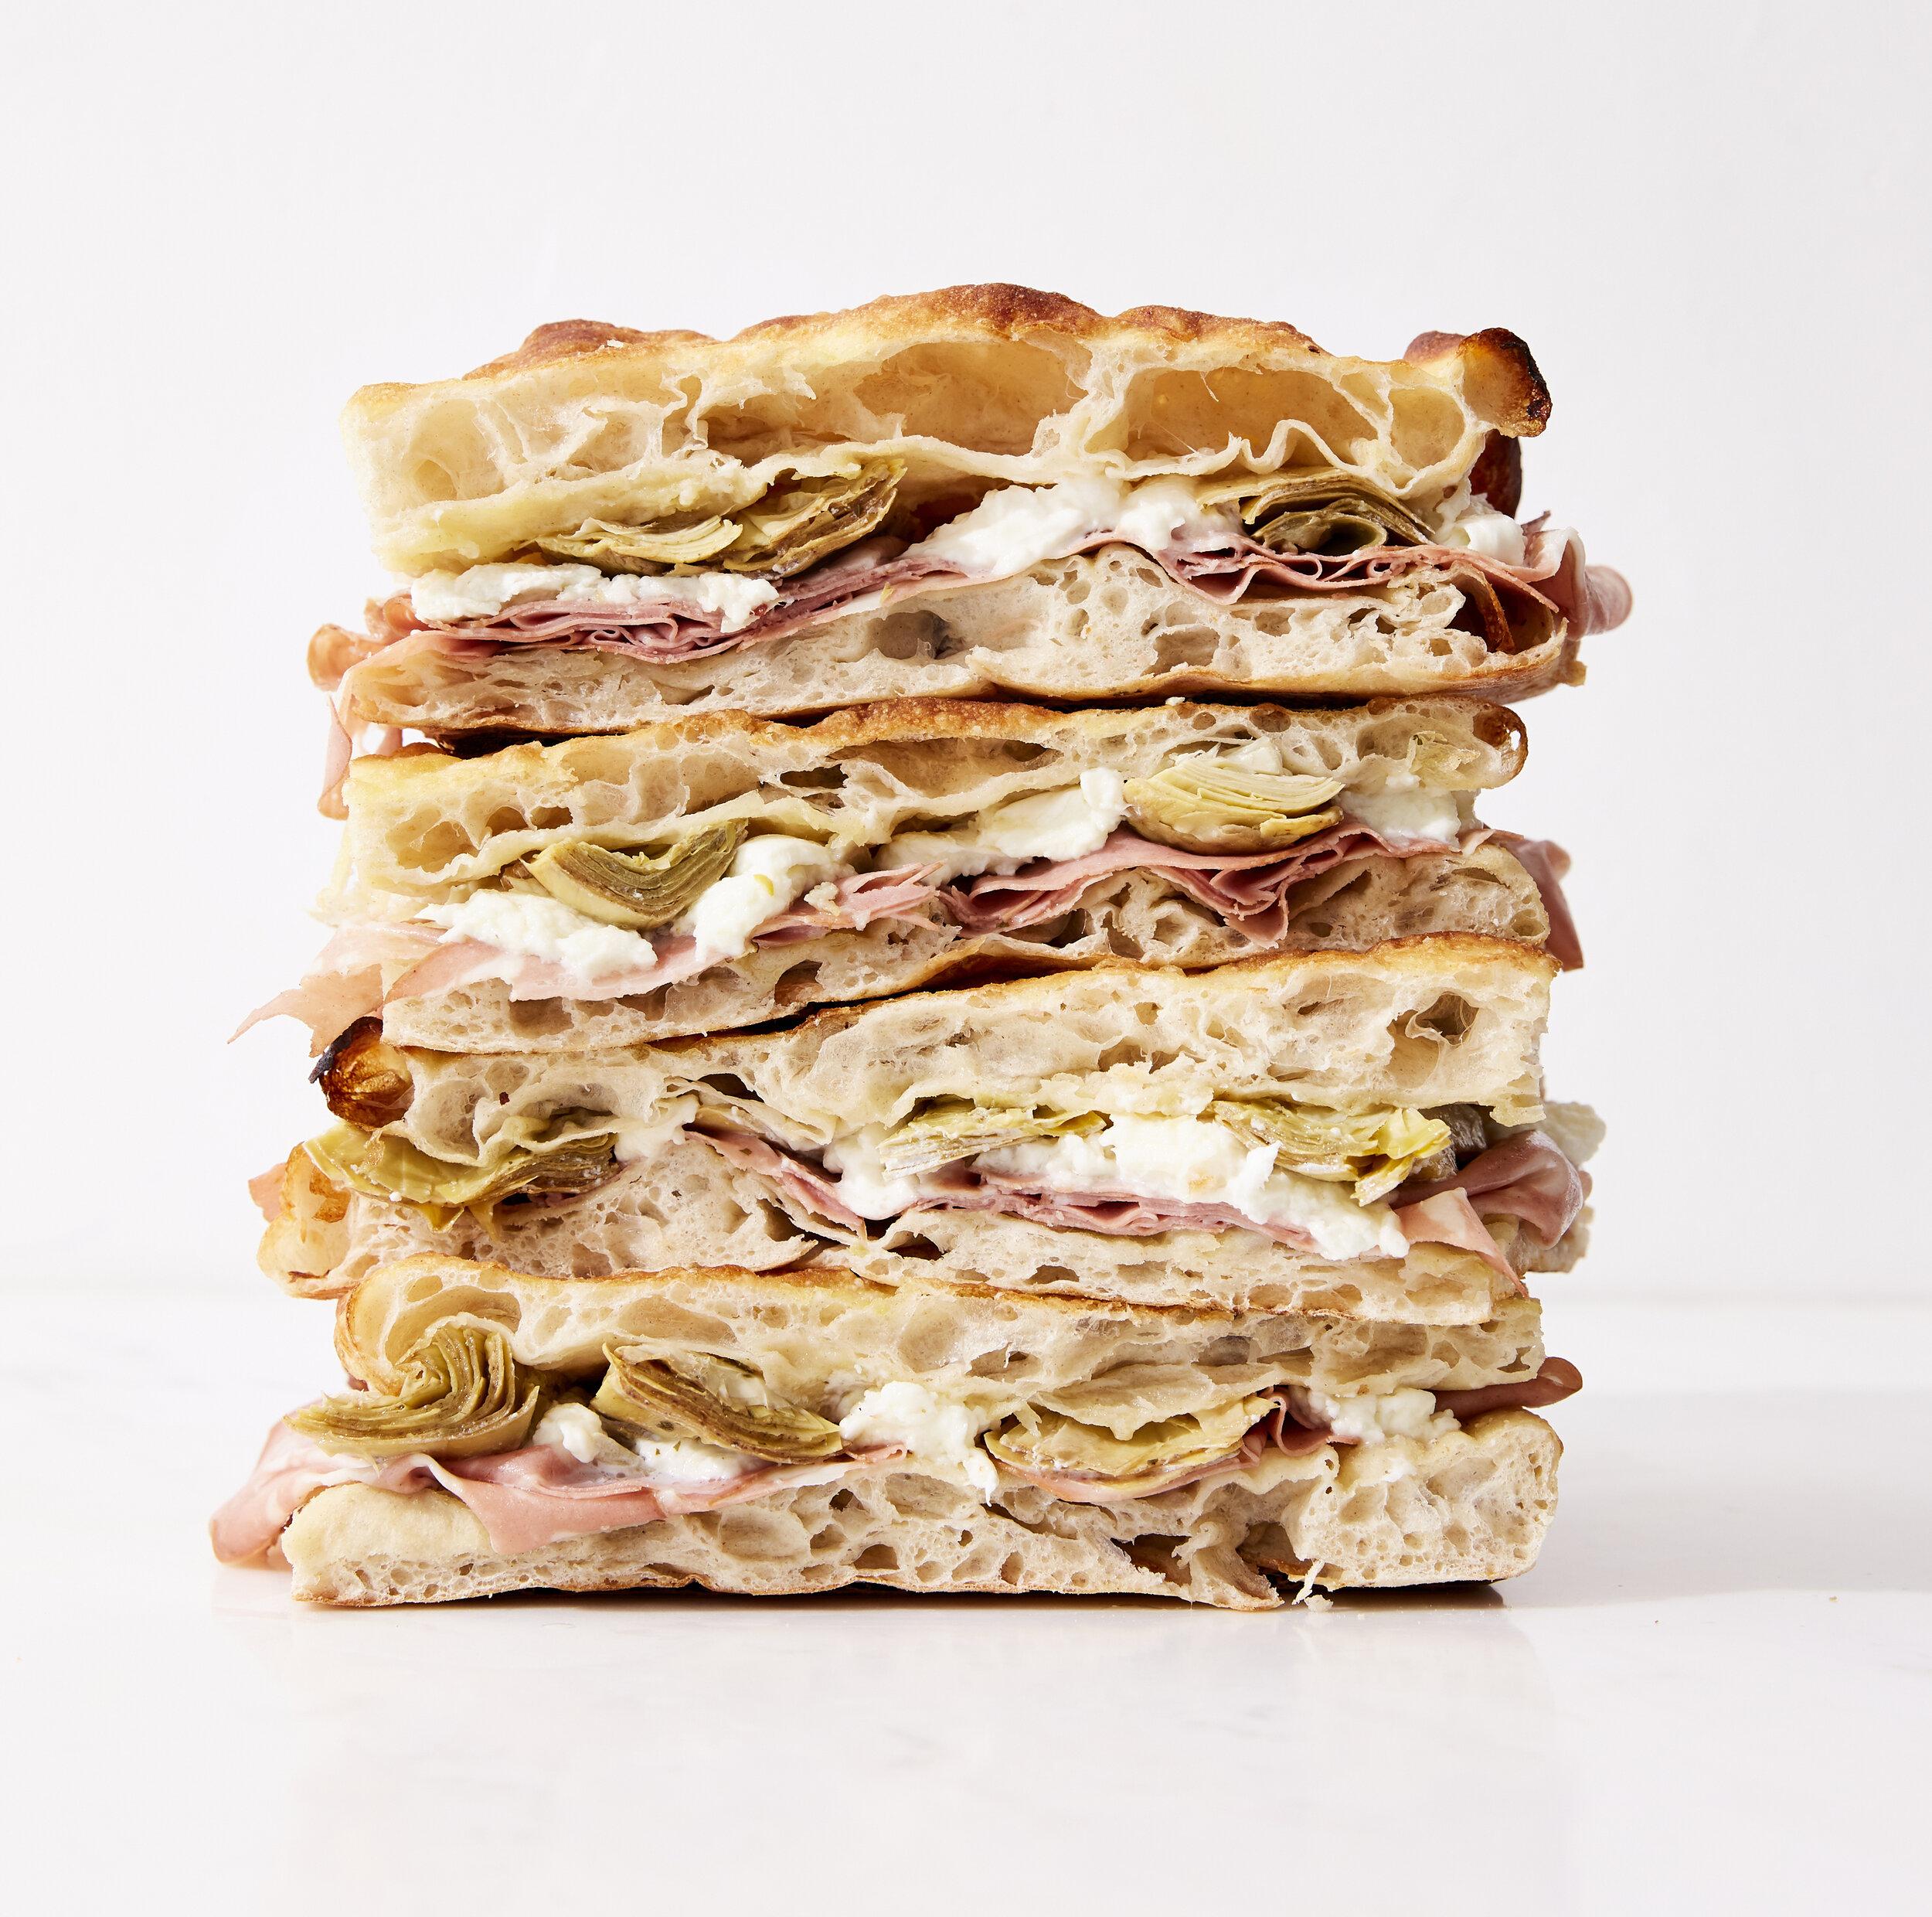 Sandwich_02.jpg